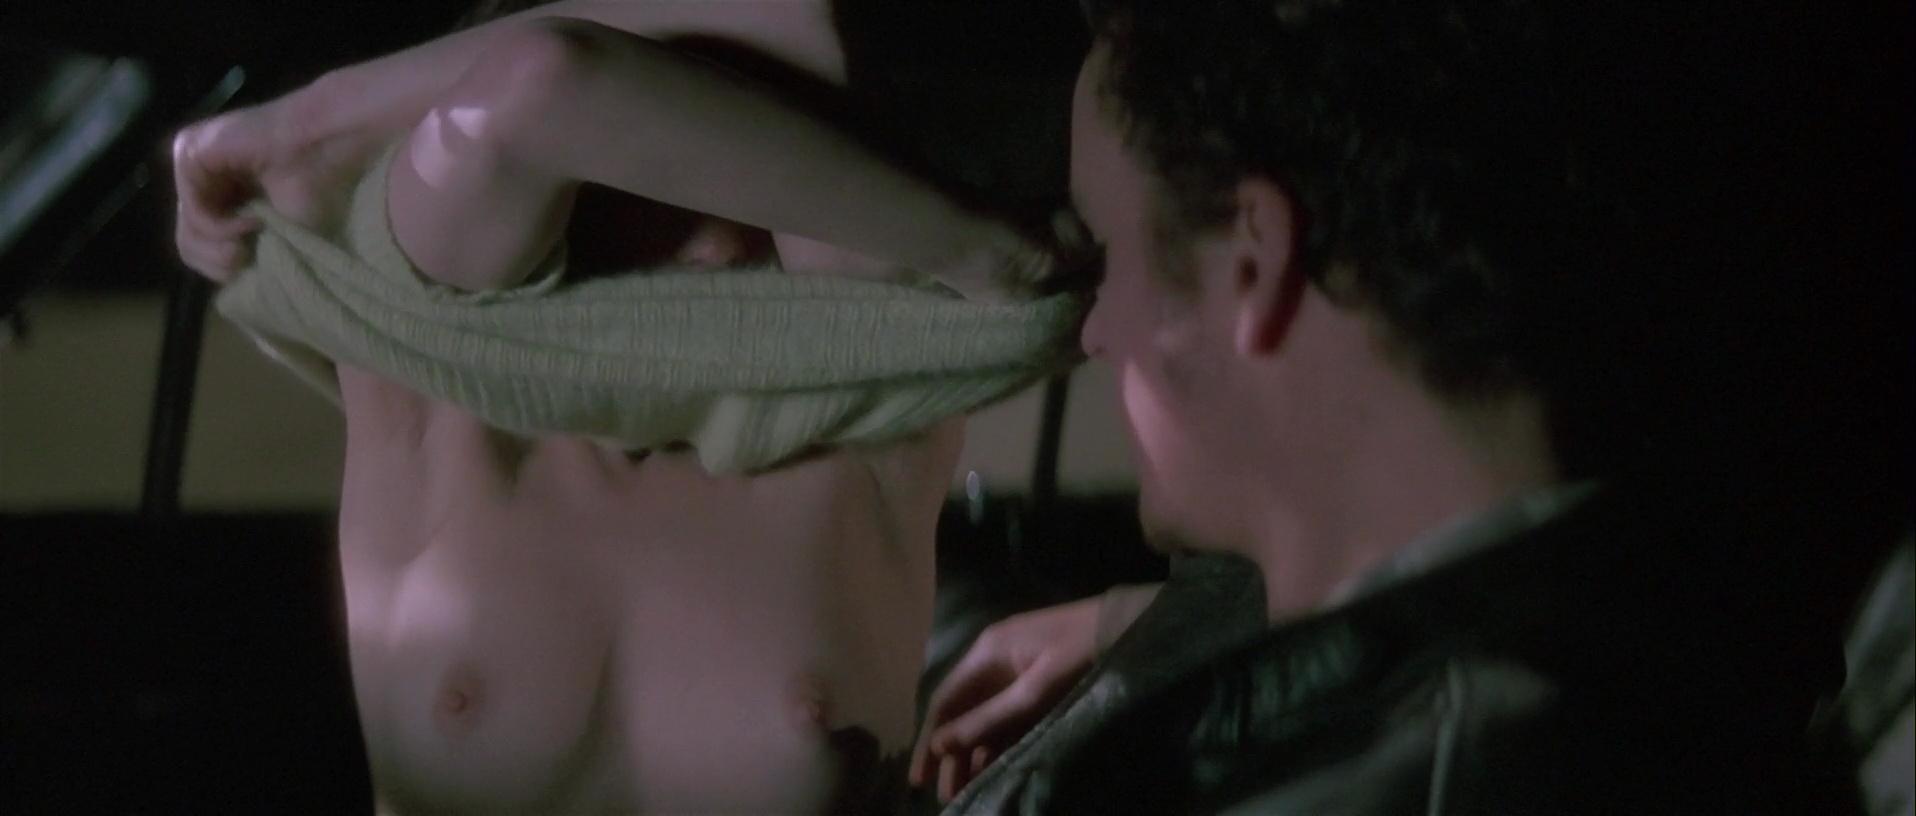 Hentai lesbian nipple clamps